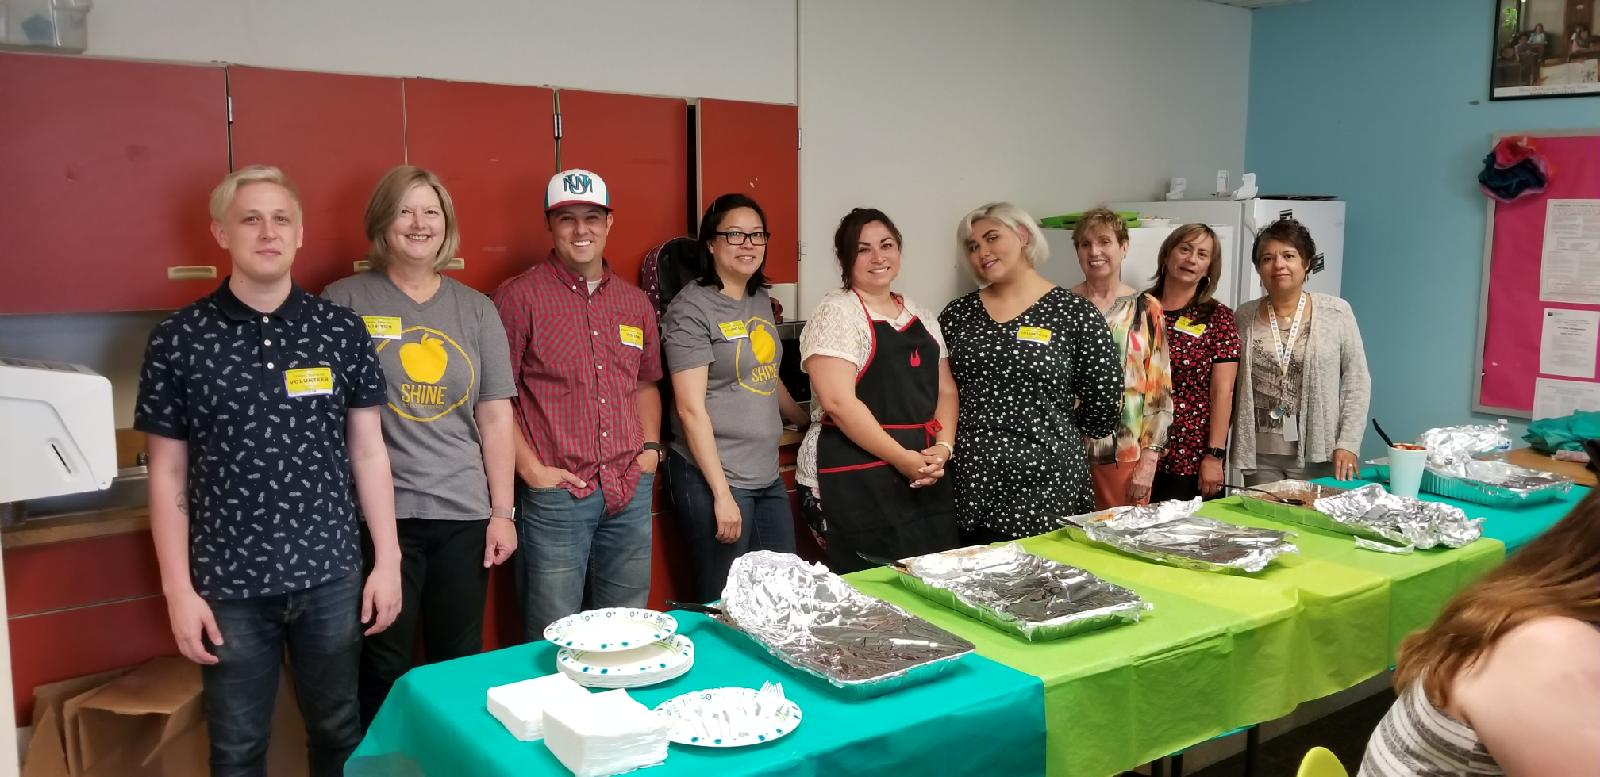 Shine volunteers from Mosaic Church host a staff appreciation luncheon for Mary Ann Binford Elementary